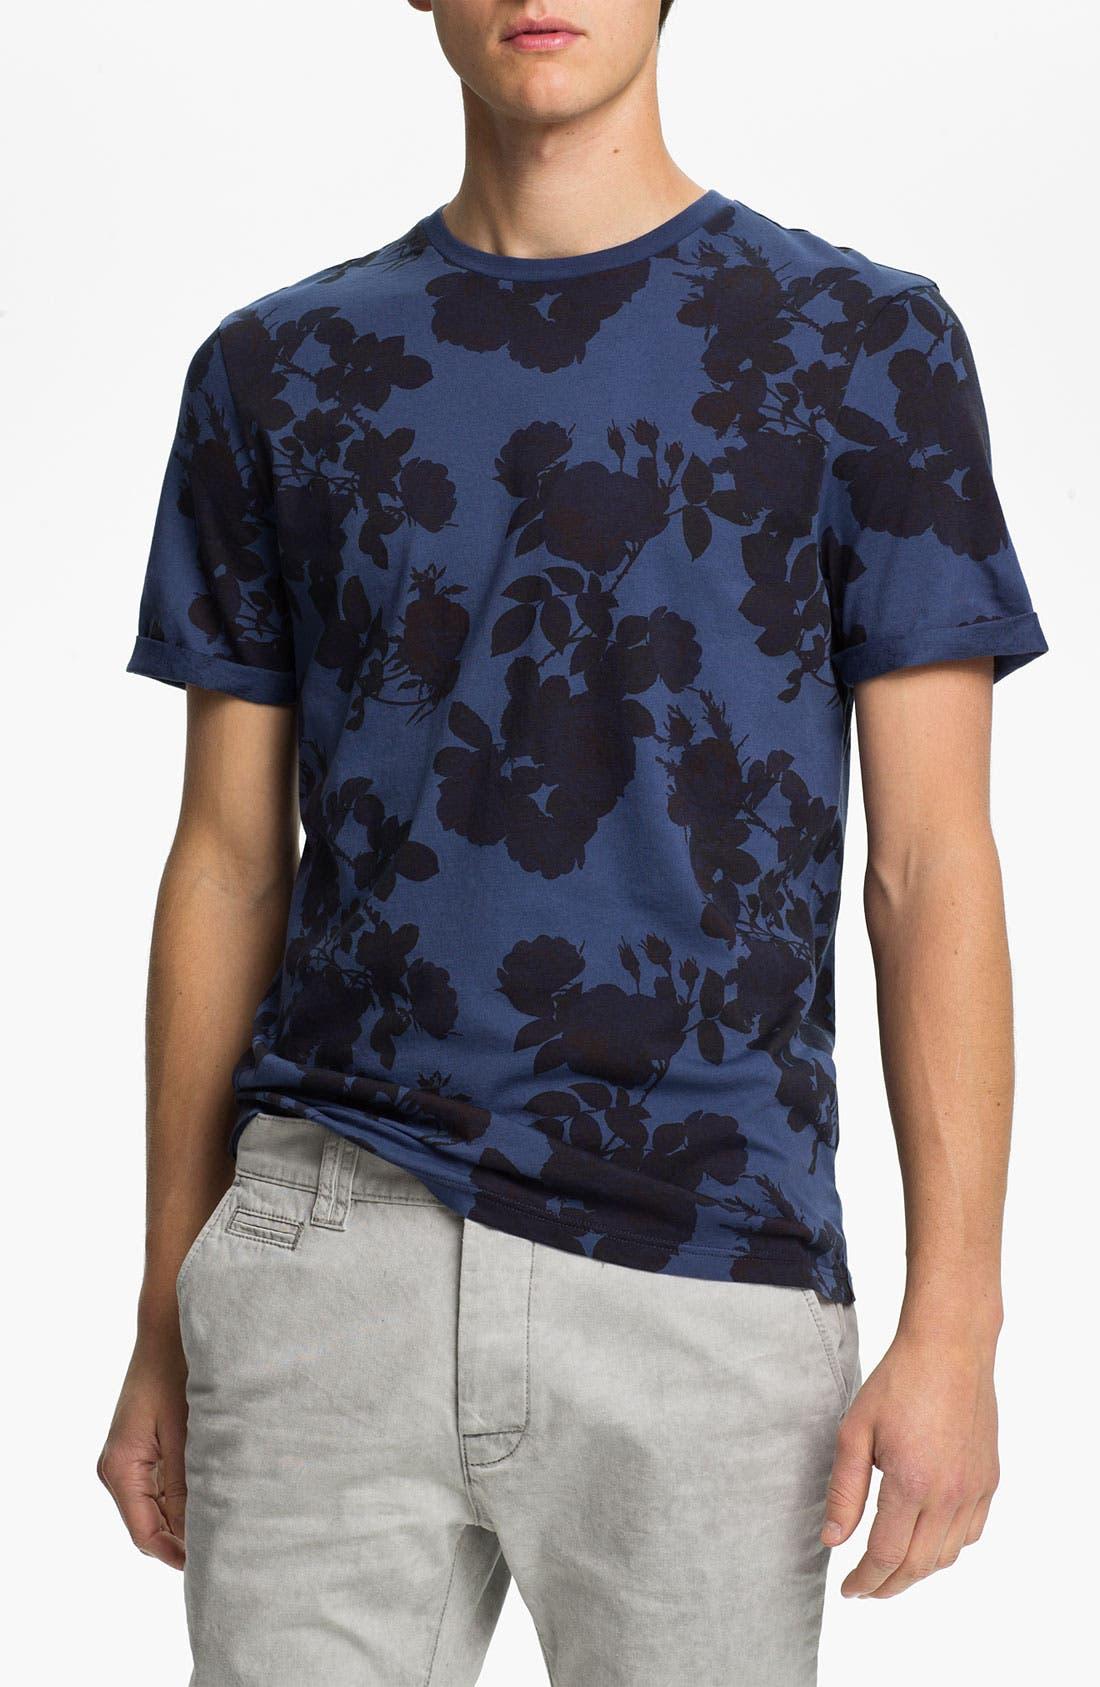 Main Image - Topman 'High Roller' Allover Floral Print T-Shirt